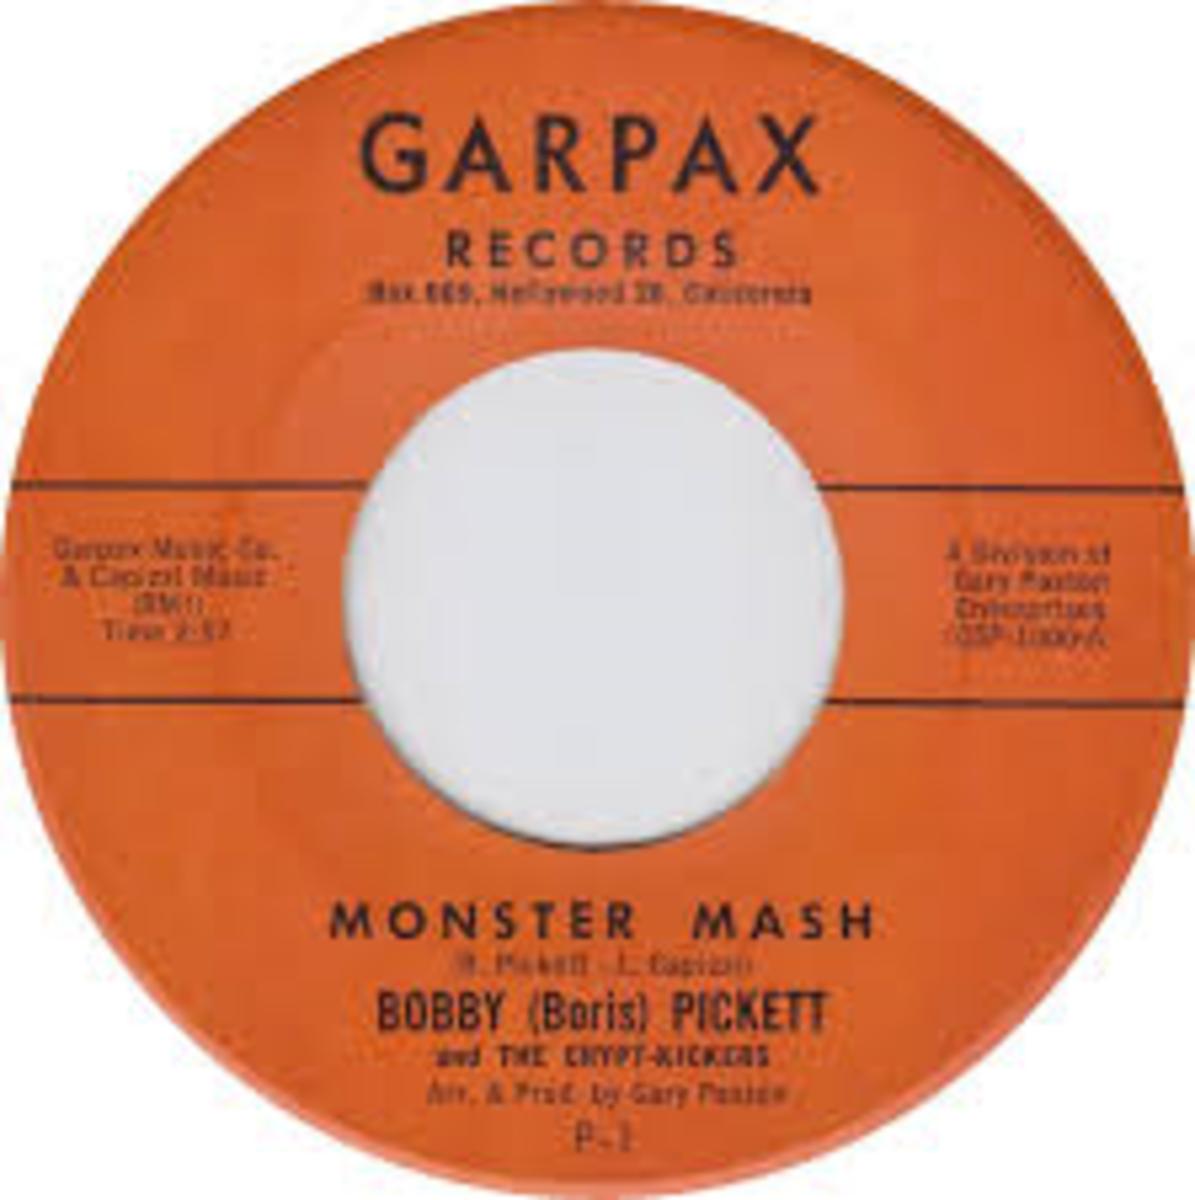 Monster Mash released in 1962.